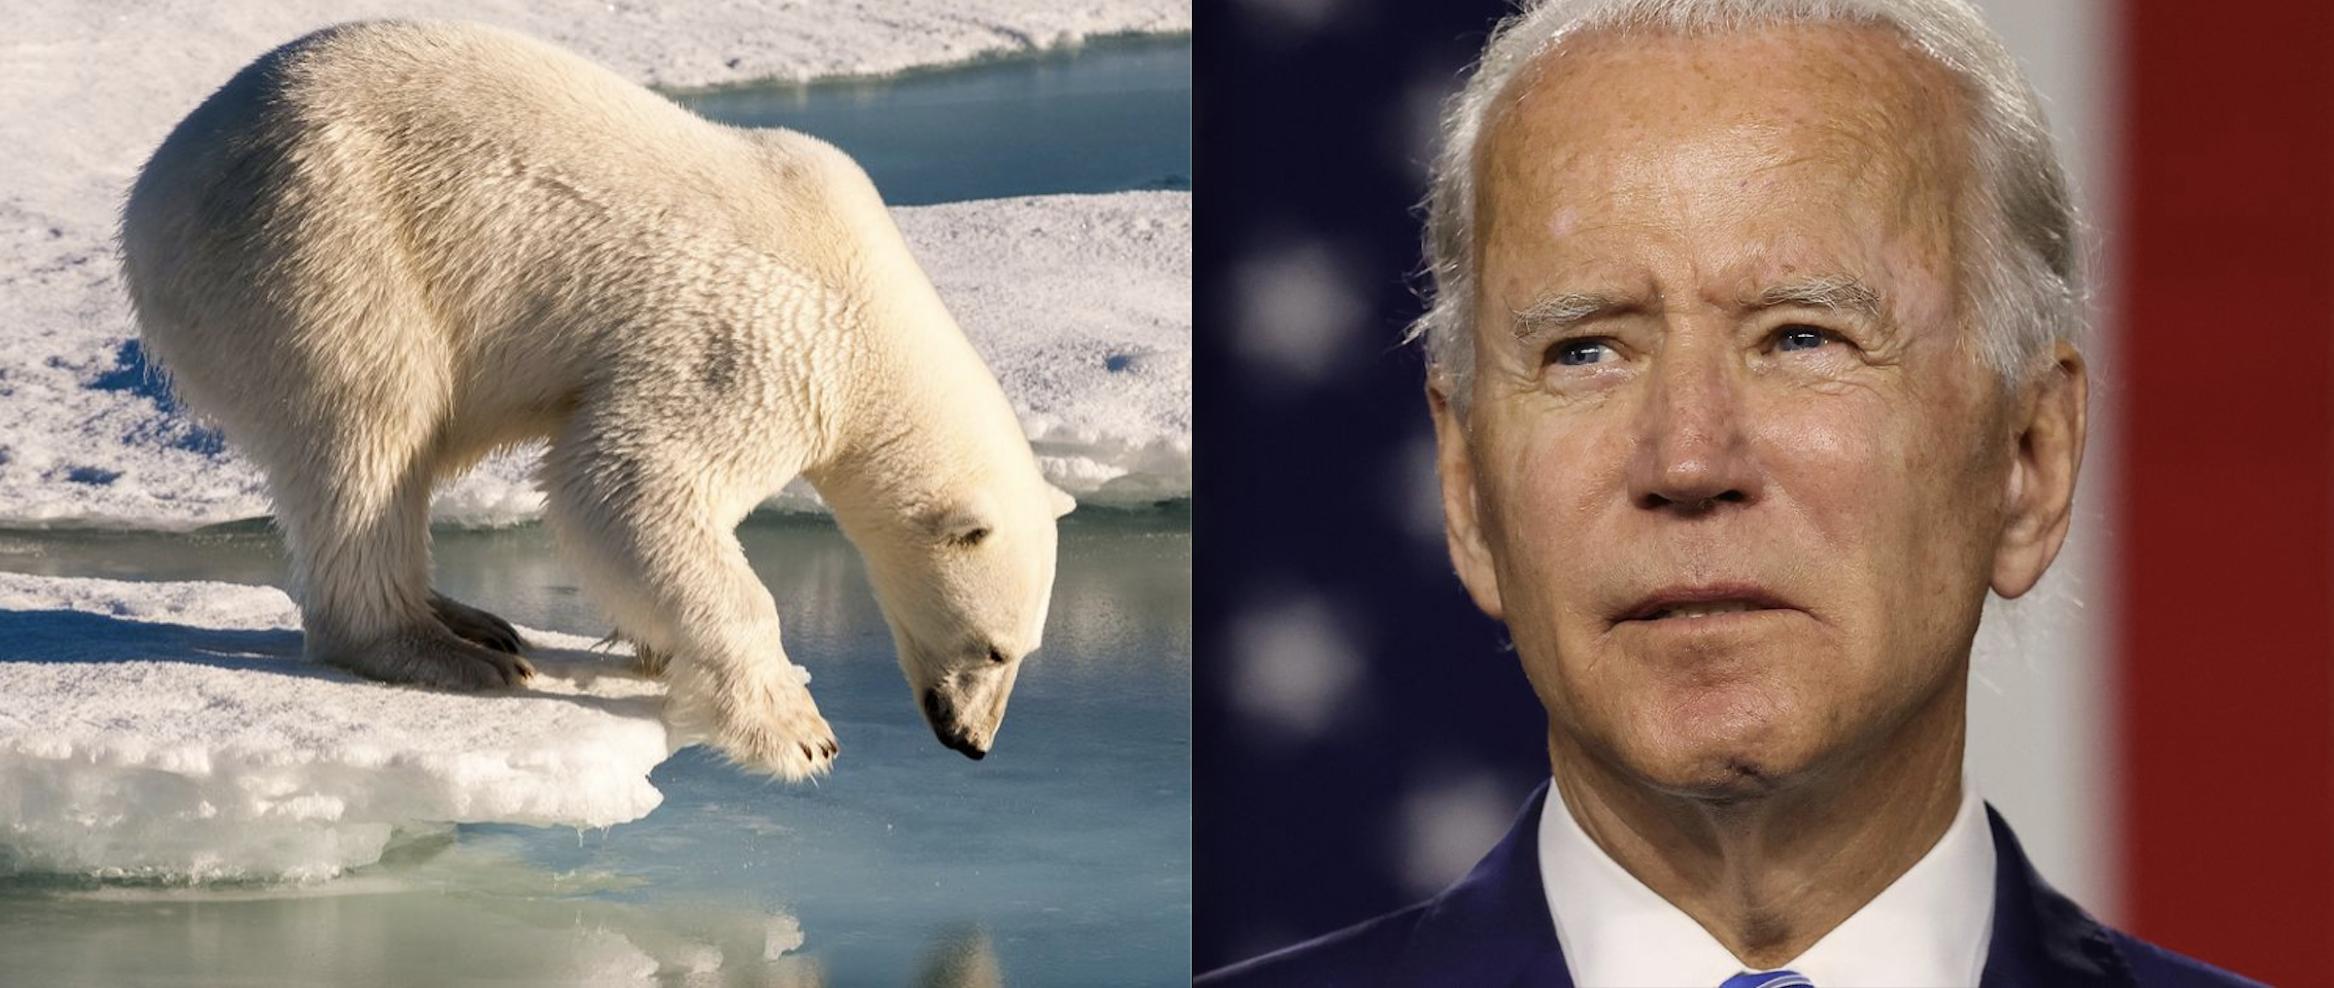 With Trump's Late-Term 'War on Wildlife,' 135 NGOs Implore Biden for E.O. to Slow the 'Extinction Crisis'